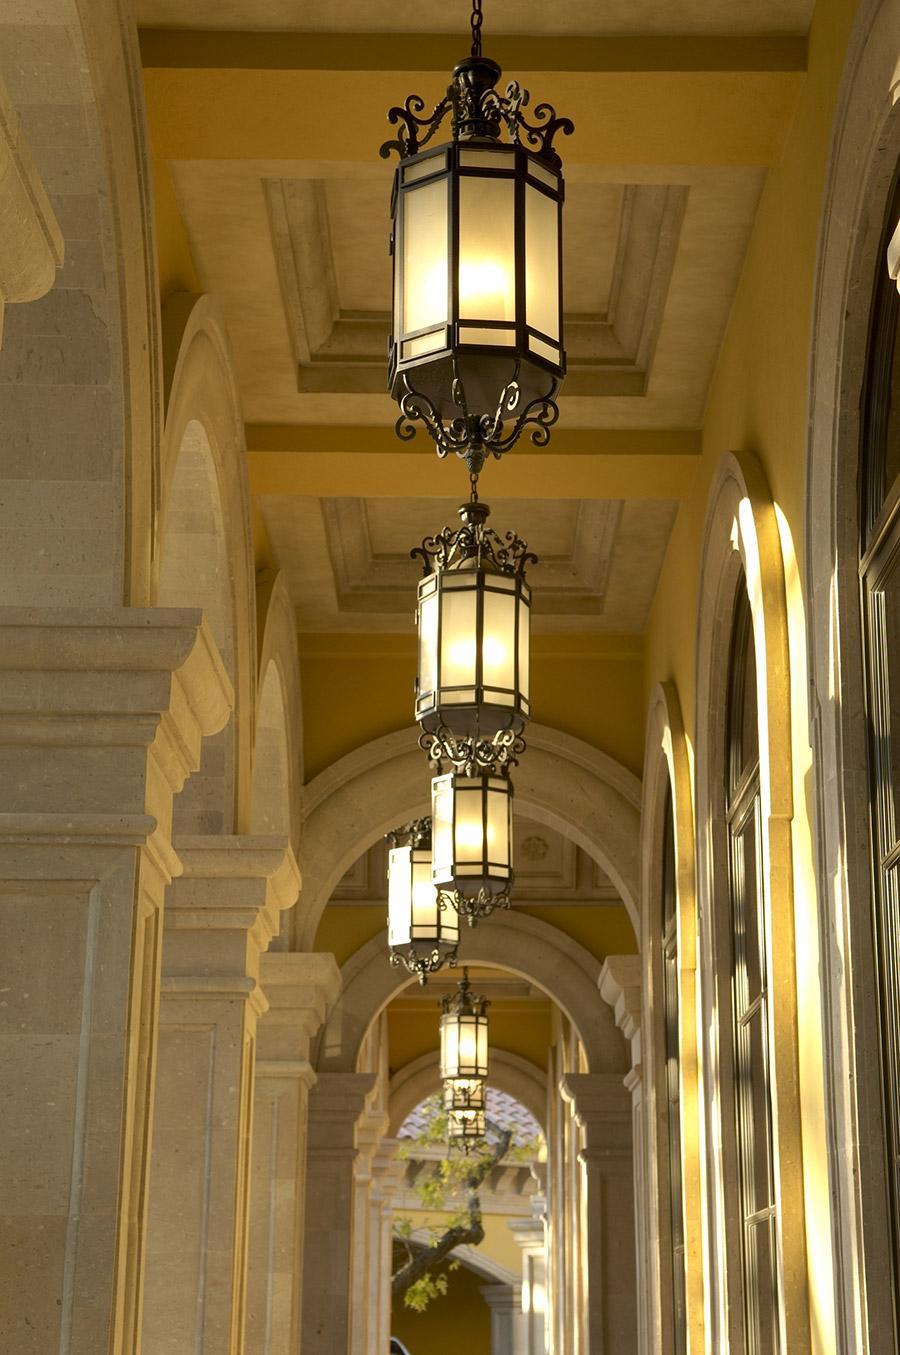 Alexandria-OLS-CLA-F-006-classic-outdoor-Steel-Wall-Mount-Lighting-Santa-Barbara-Residence-(5)